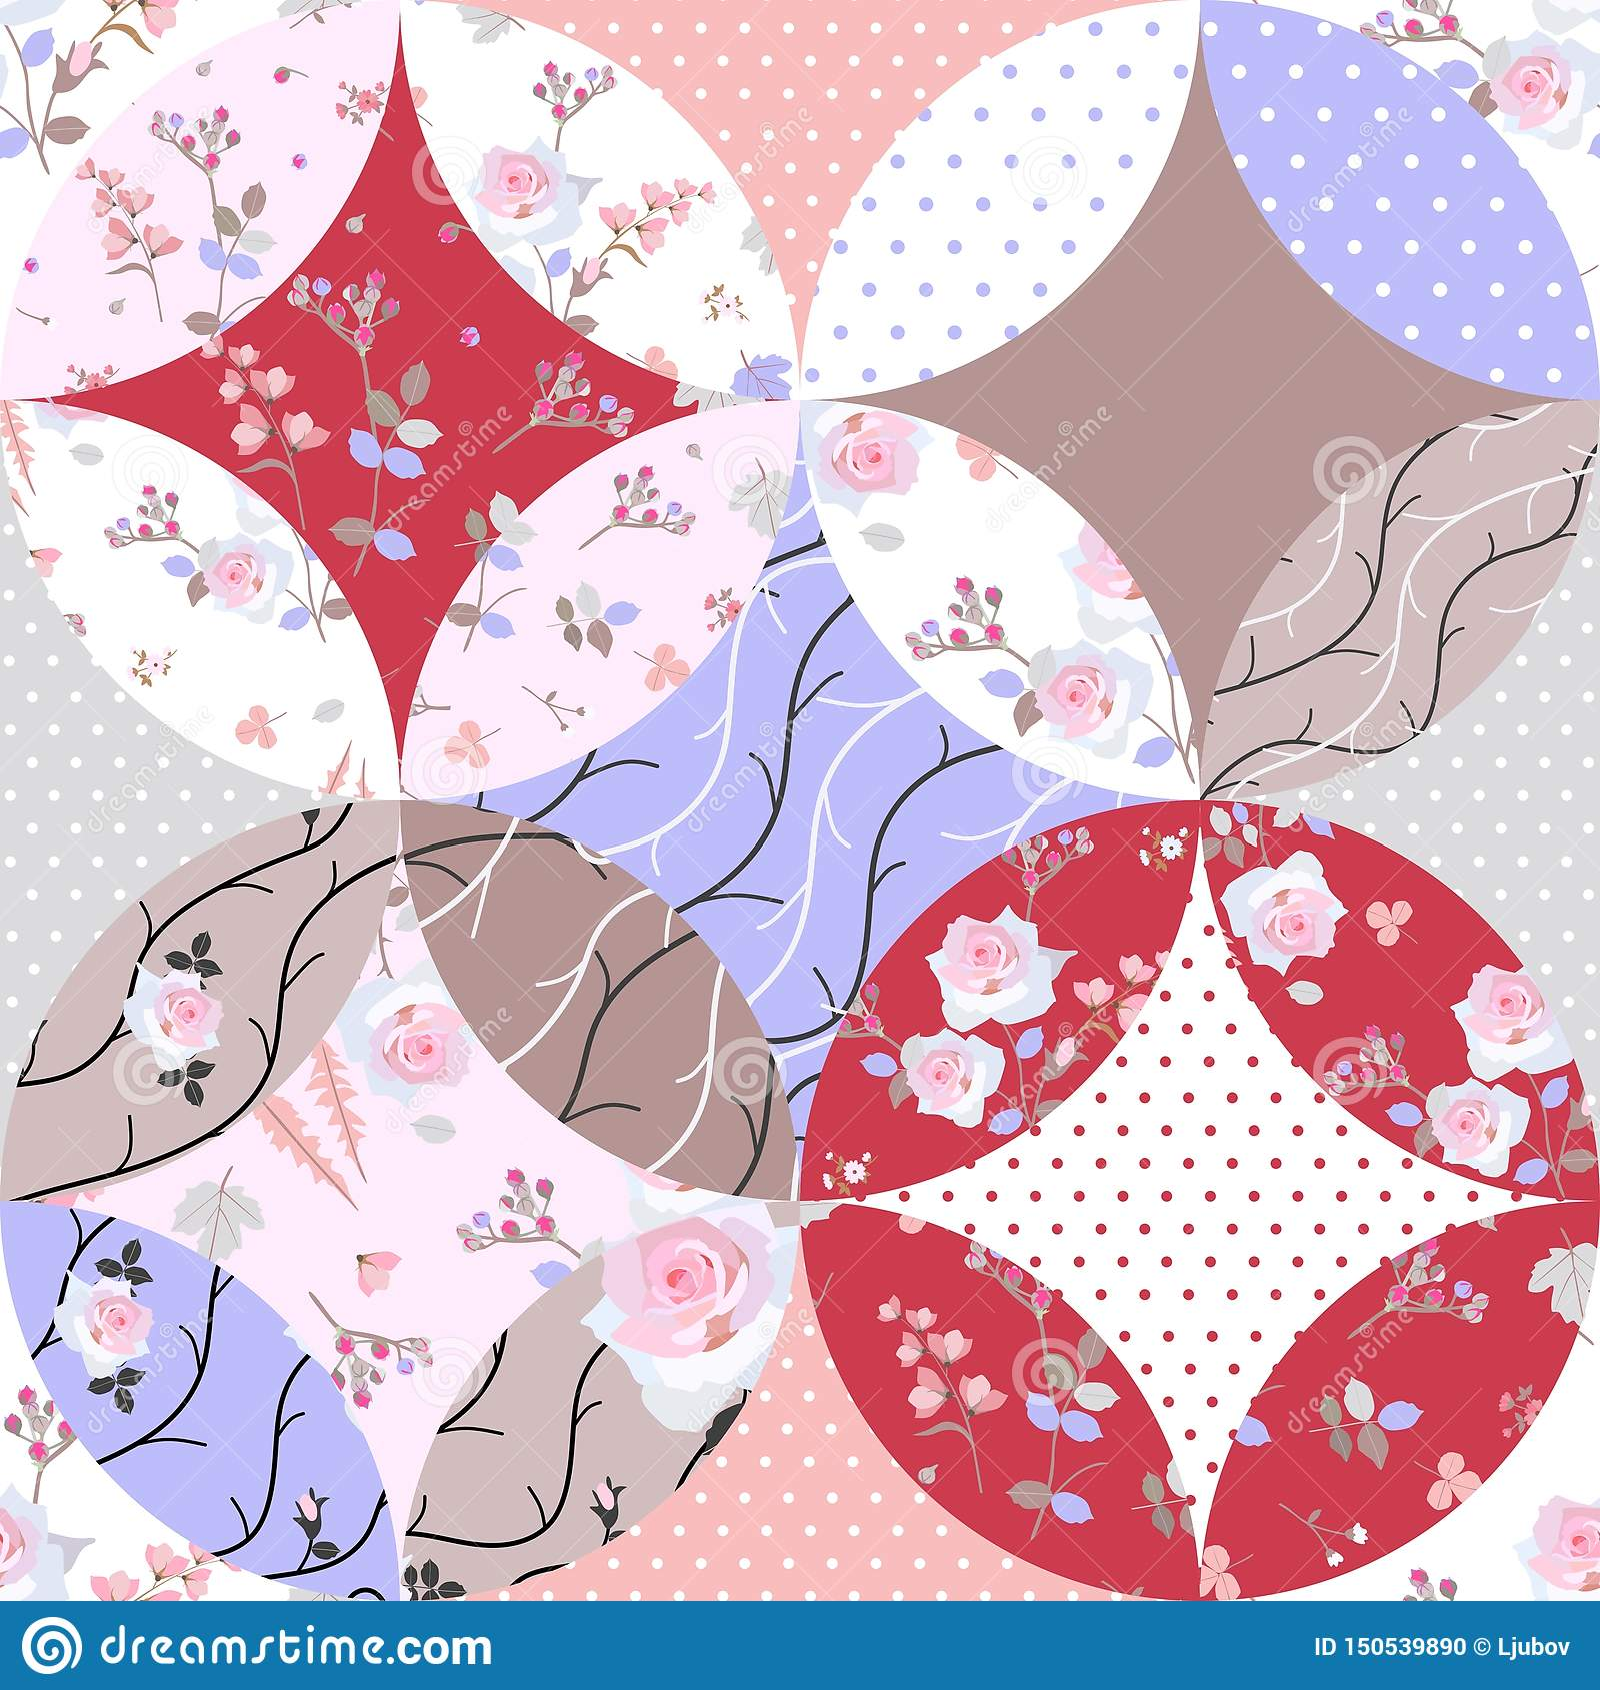 Textile Patches Stock Illustrations 3 866 Textile Patches Stock Illustrations Vectors Clipart Dreamstime